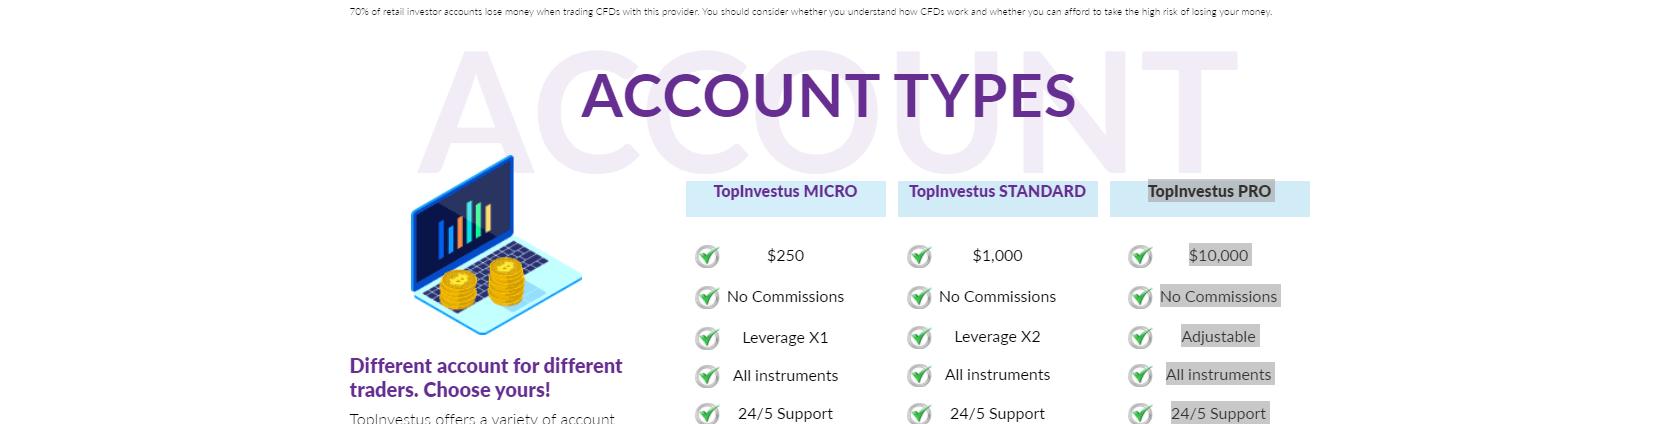 TopInvestus Account Types